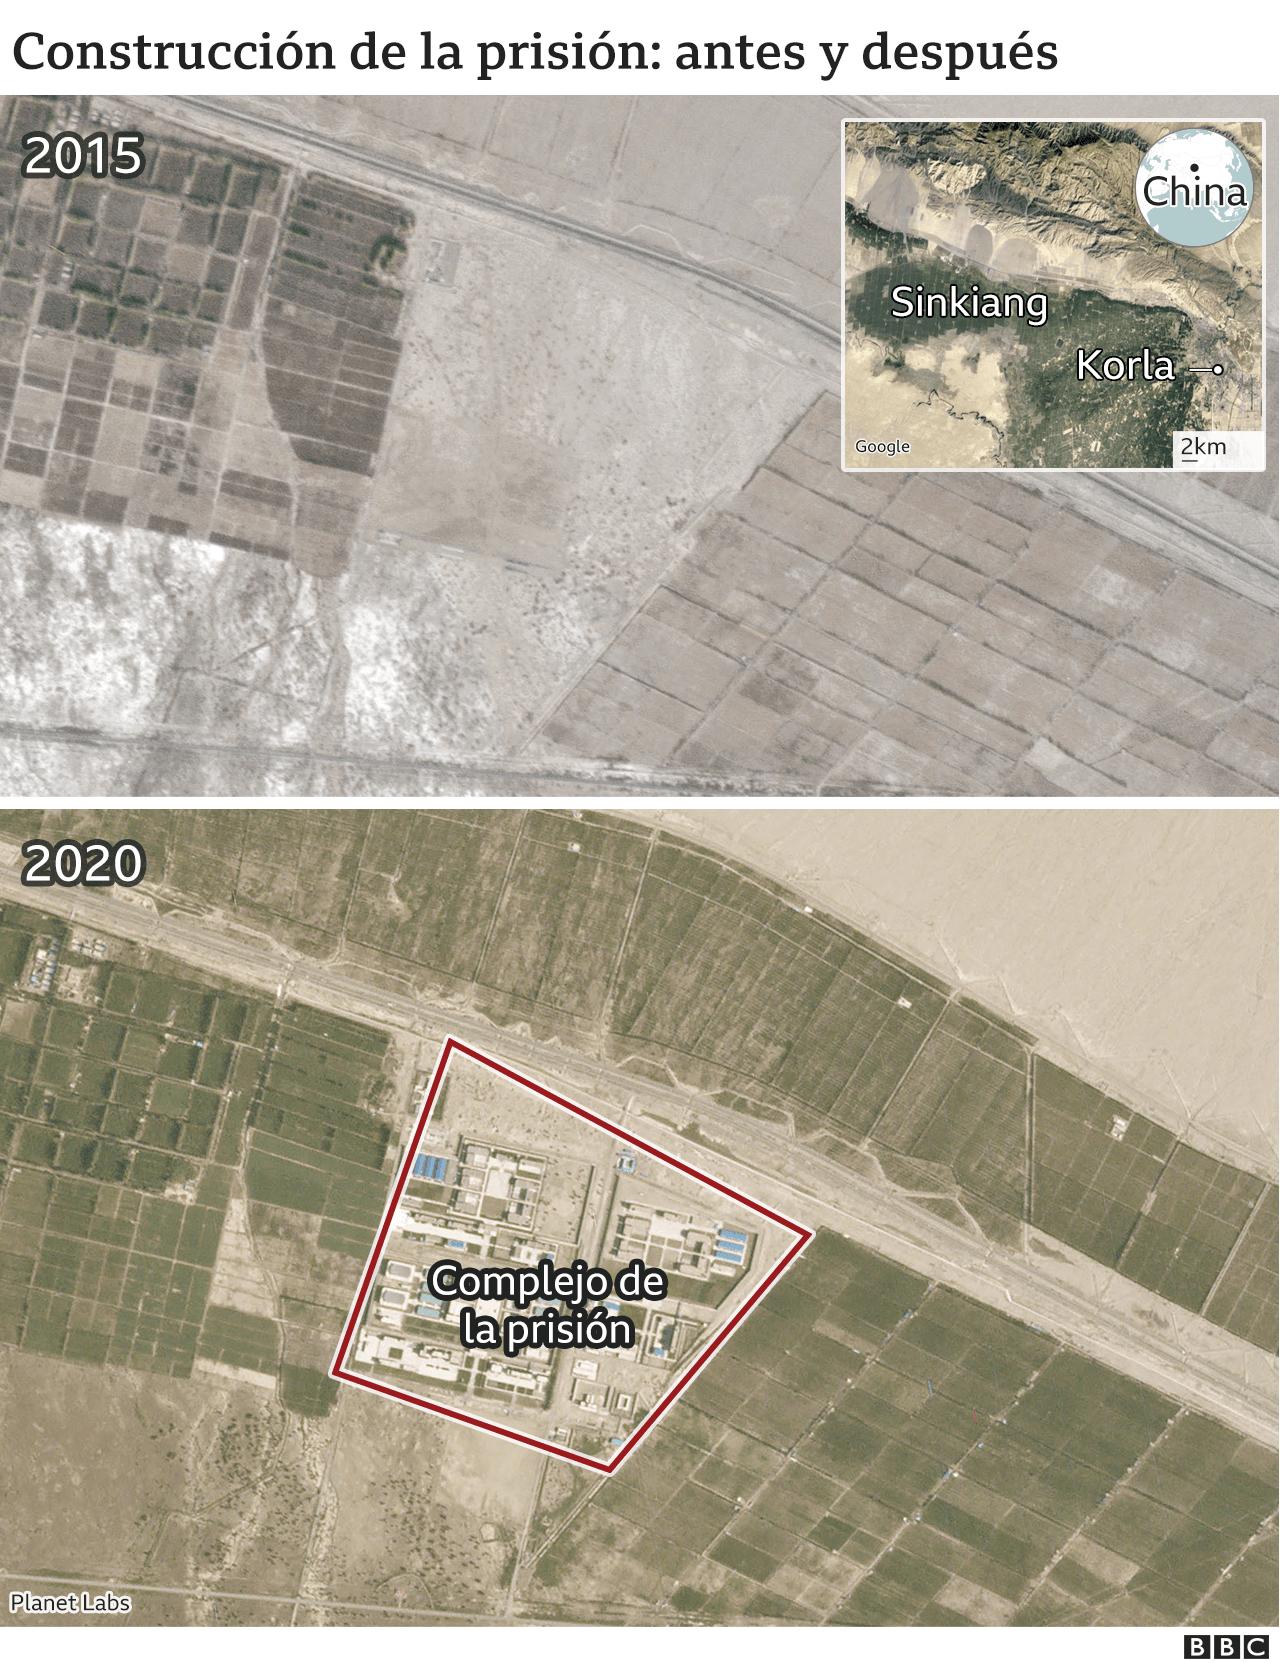 Mapa satelital del terreno donde se ha construido